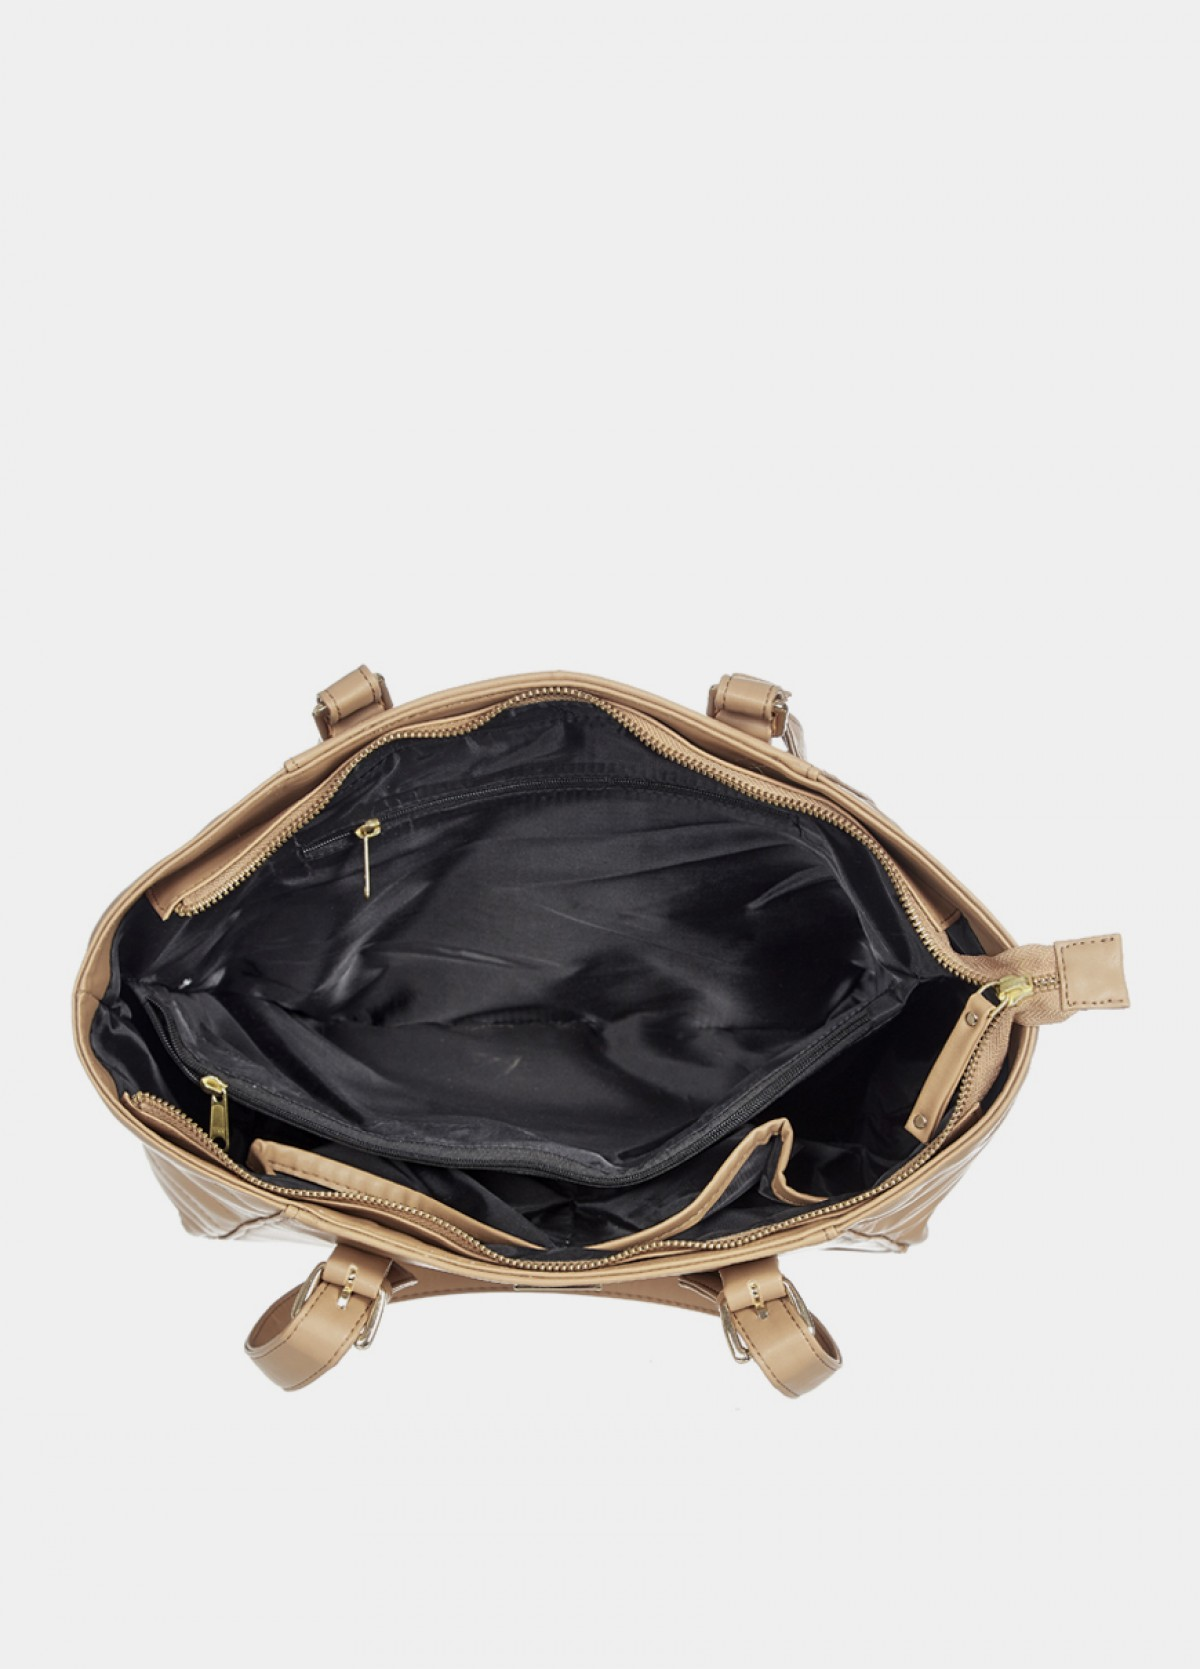 The Beige Travel Bag